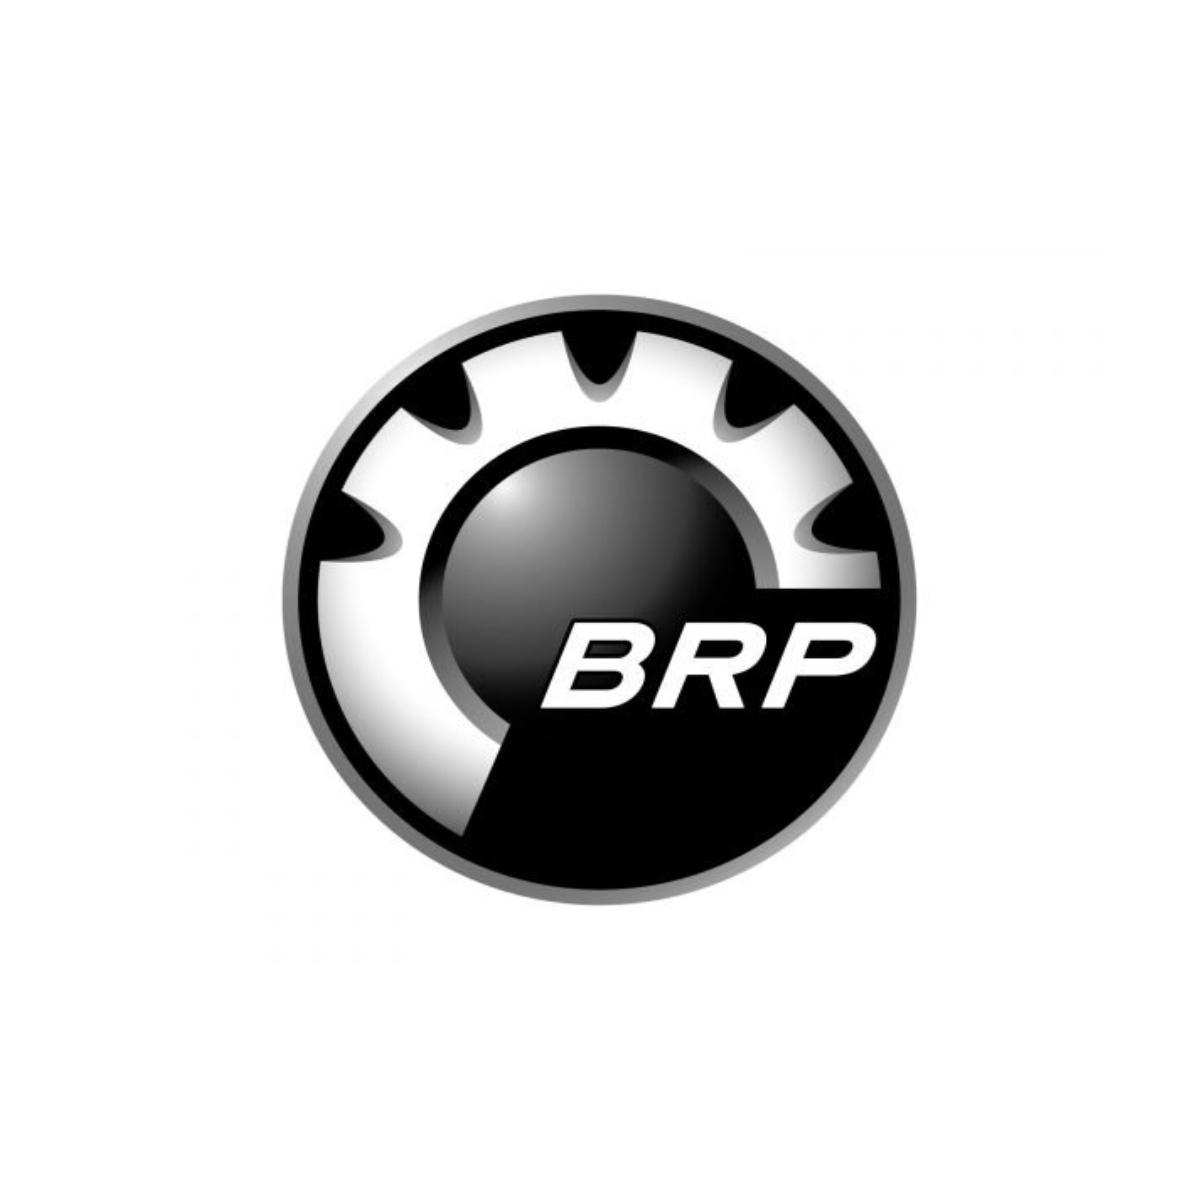 Concha Reverso Jet Ski Sea Doo GTI/RXP  - Radical Peças - Peças para Jet Ski